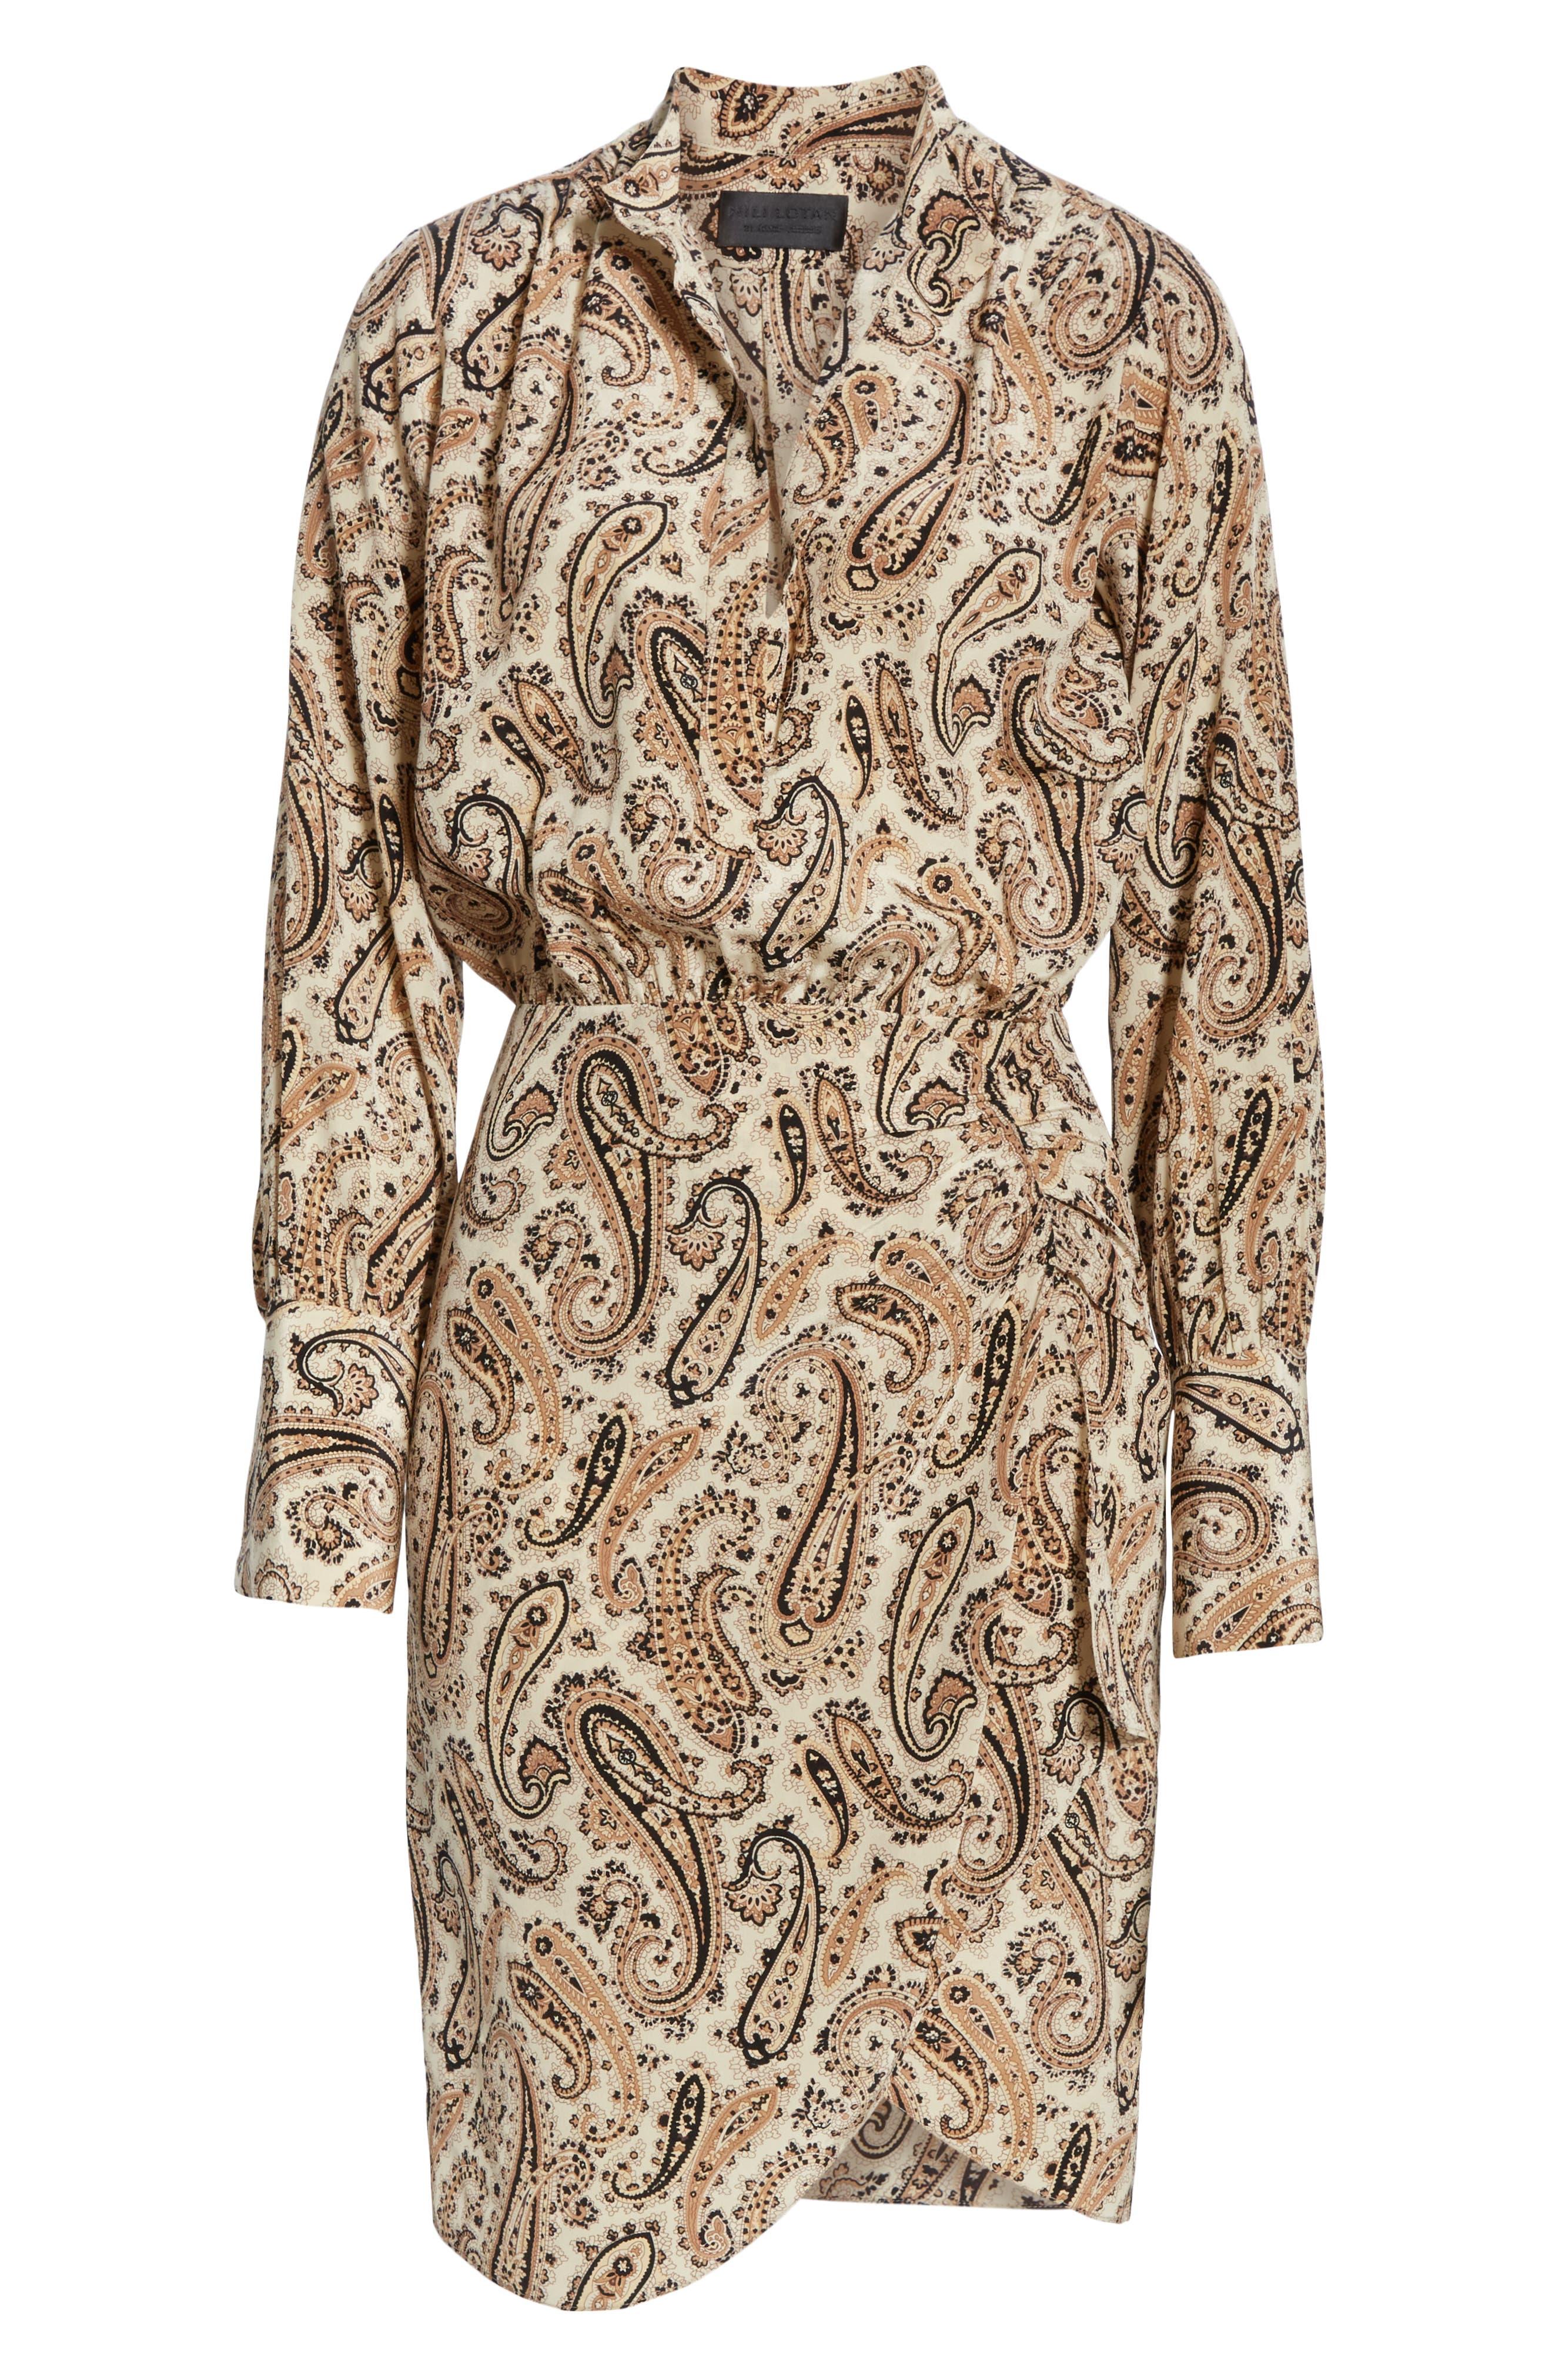 NILI LOTAN, Paisley Silk Shirtdress, Alternate thumbnail 7, color, BLACK AND BEIGE PAISLE